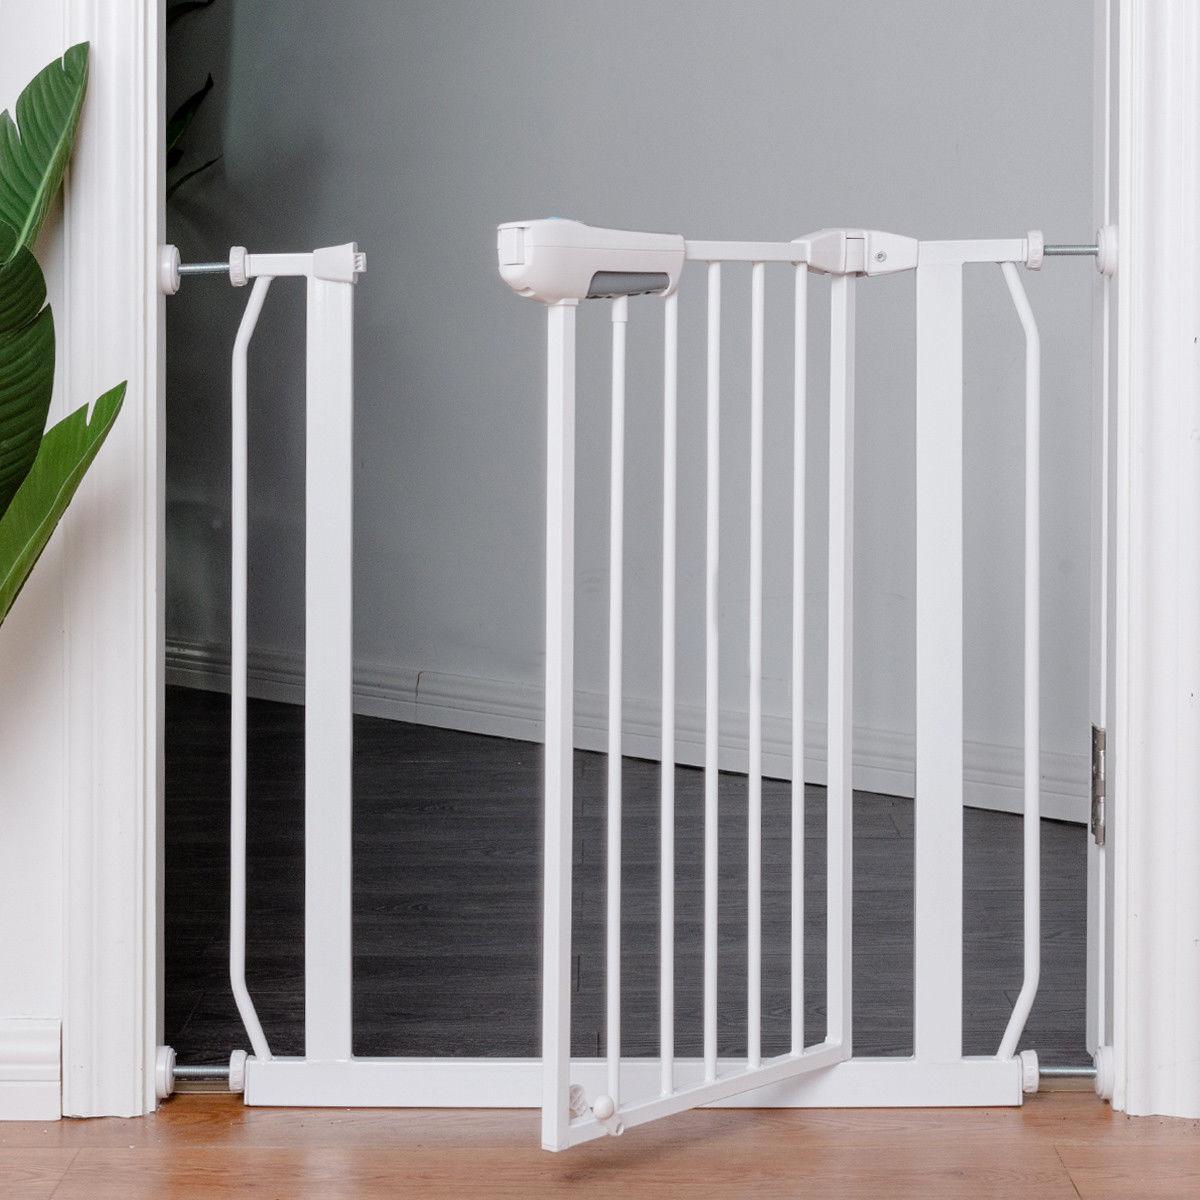 Superieur Details About Easy Locking System Kids Baby Pet Safety Gate Door Walk  Through Toddler White